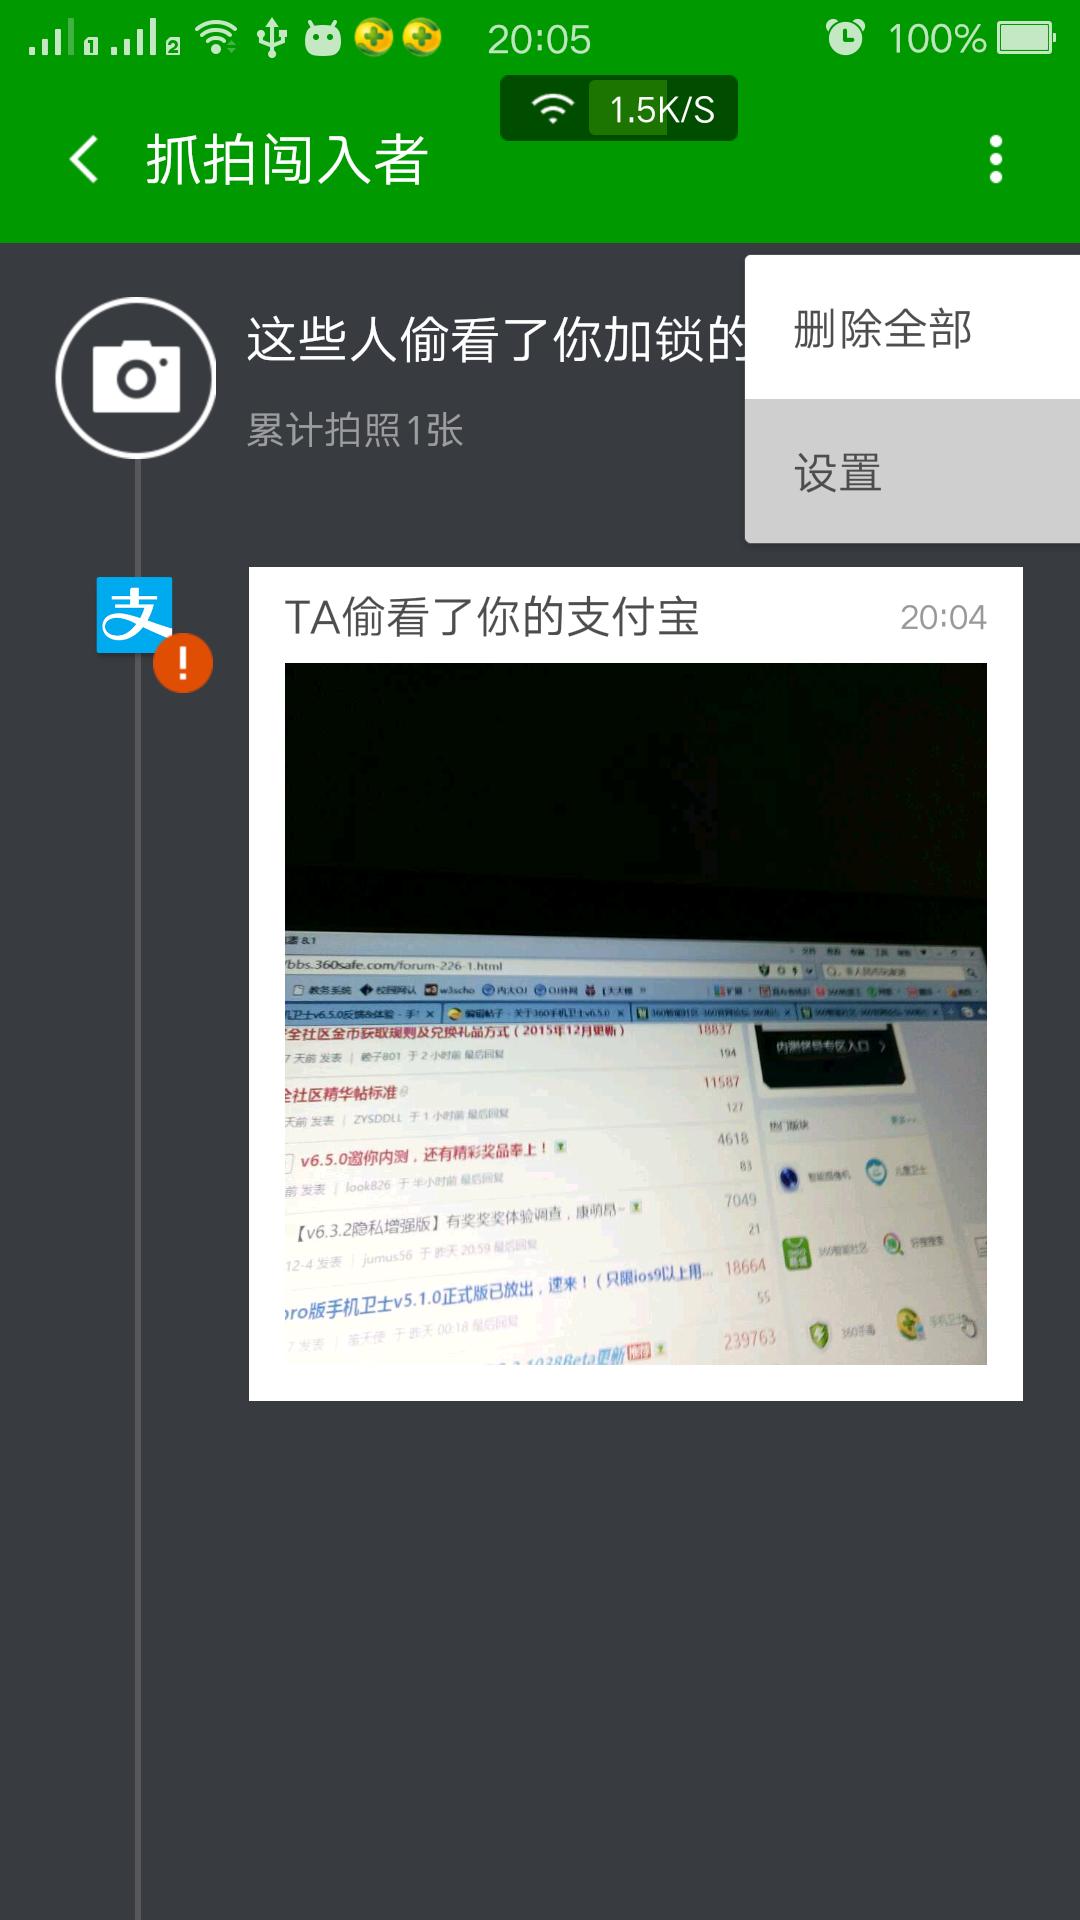 Screenshot_2015-12-22-20-05-07-166.png